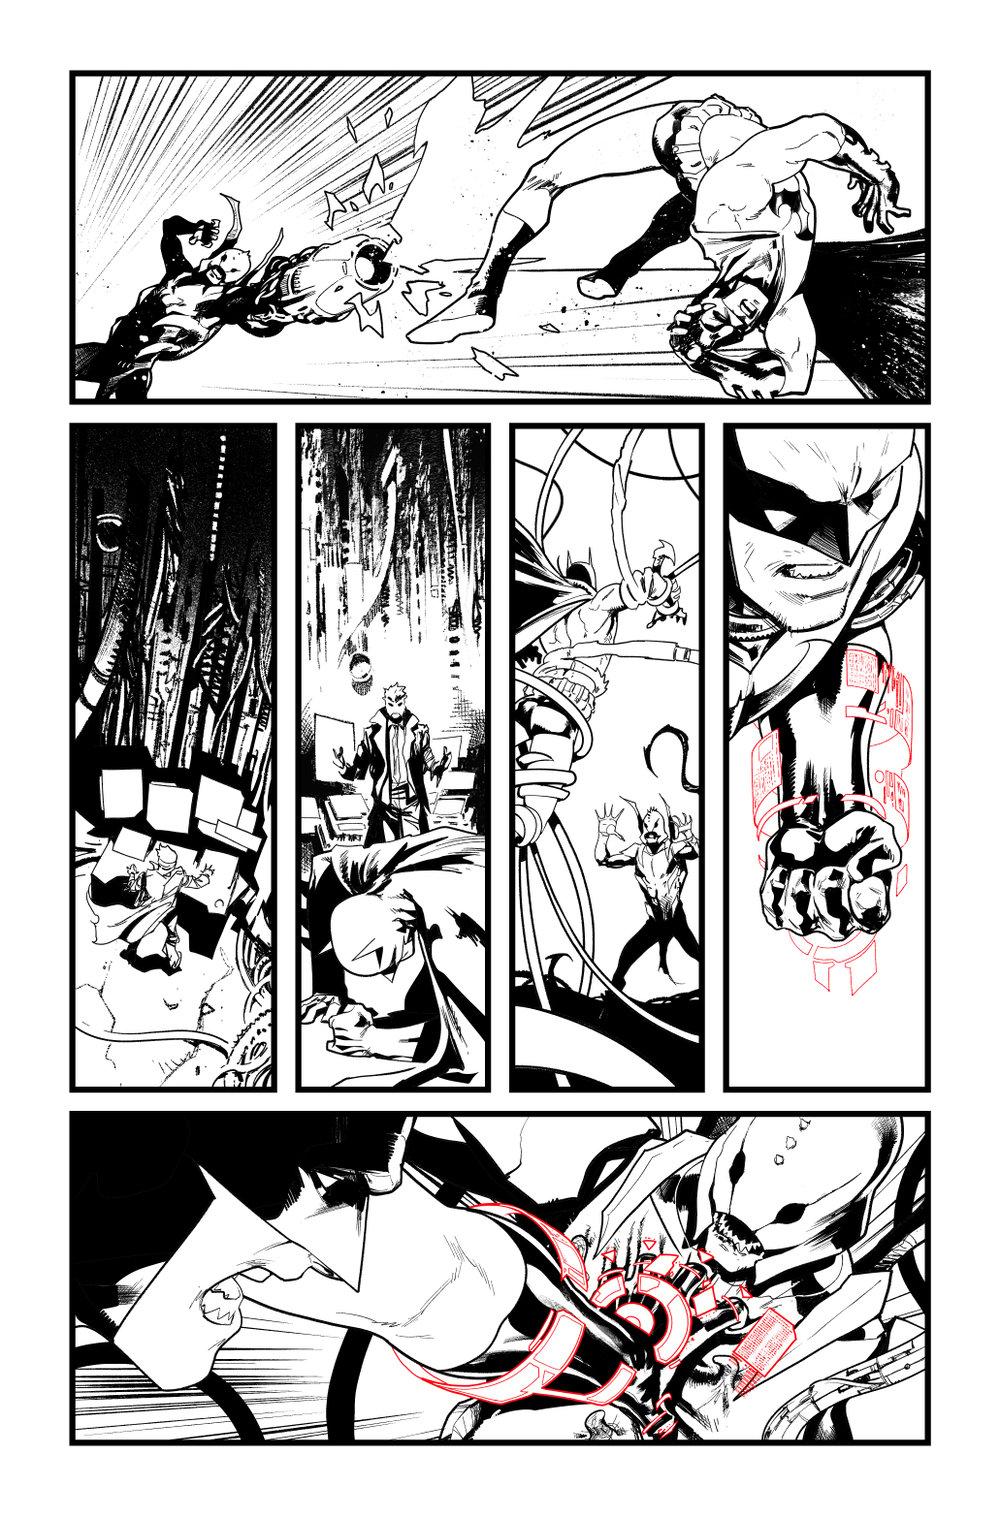 Image of BATMAN/SUPERMAN #5 p.13 ARTIST'S PROOF